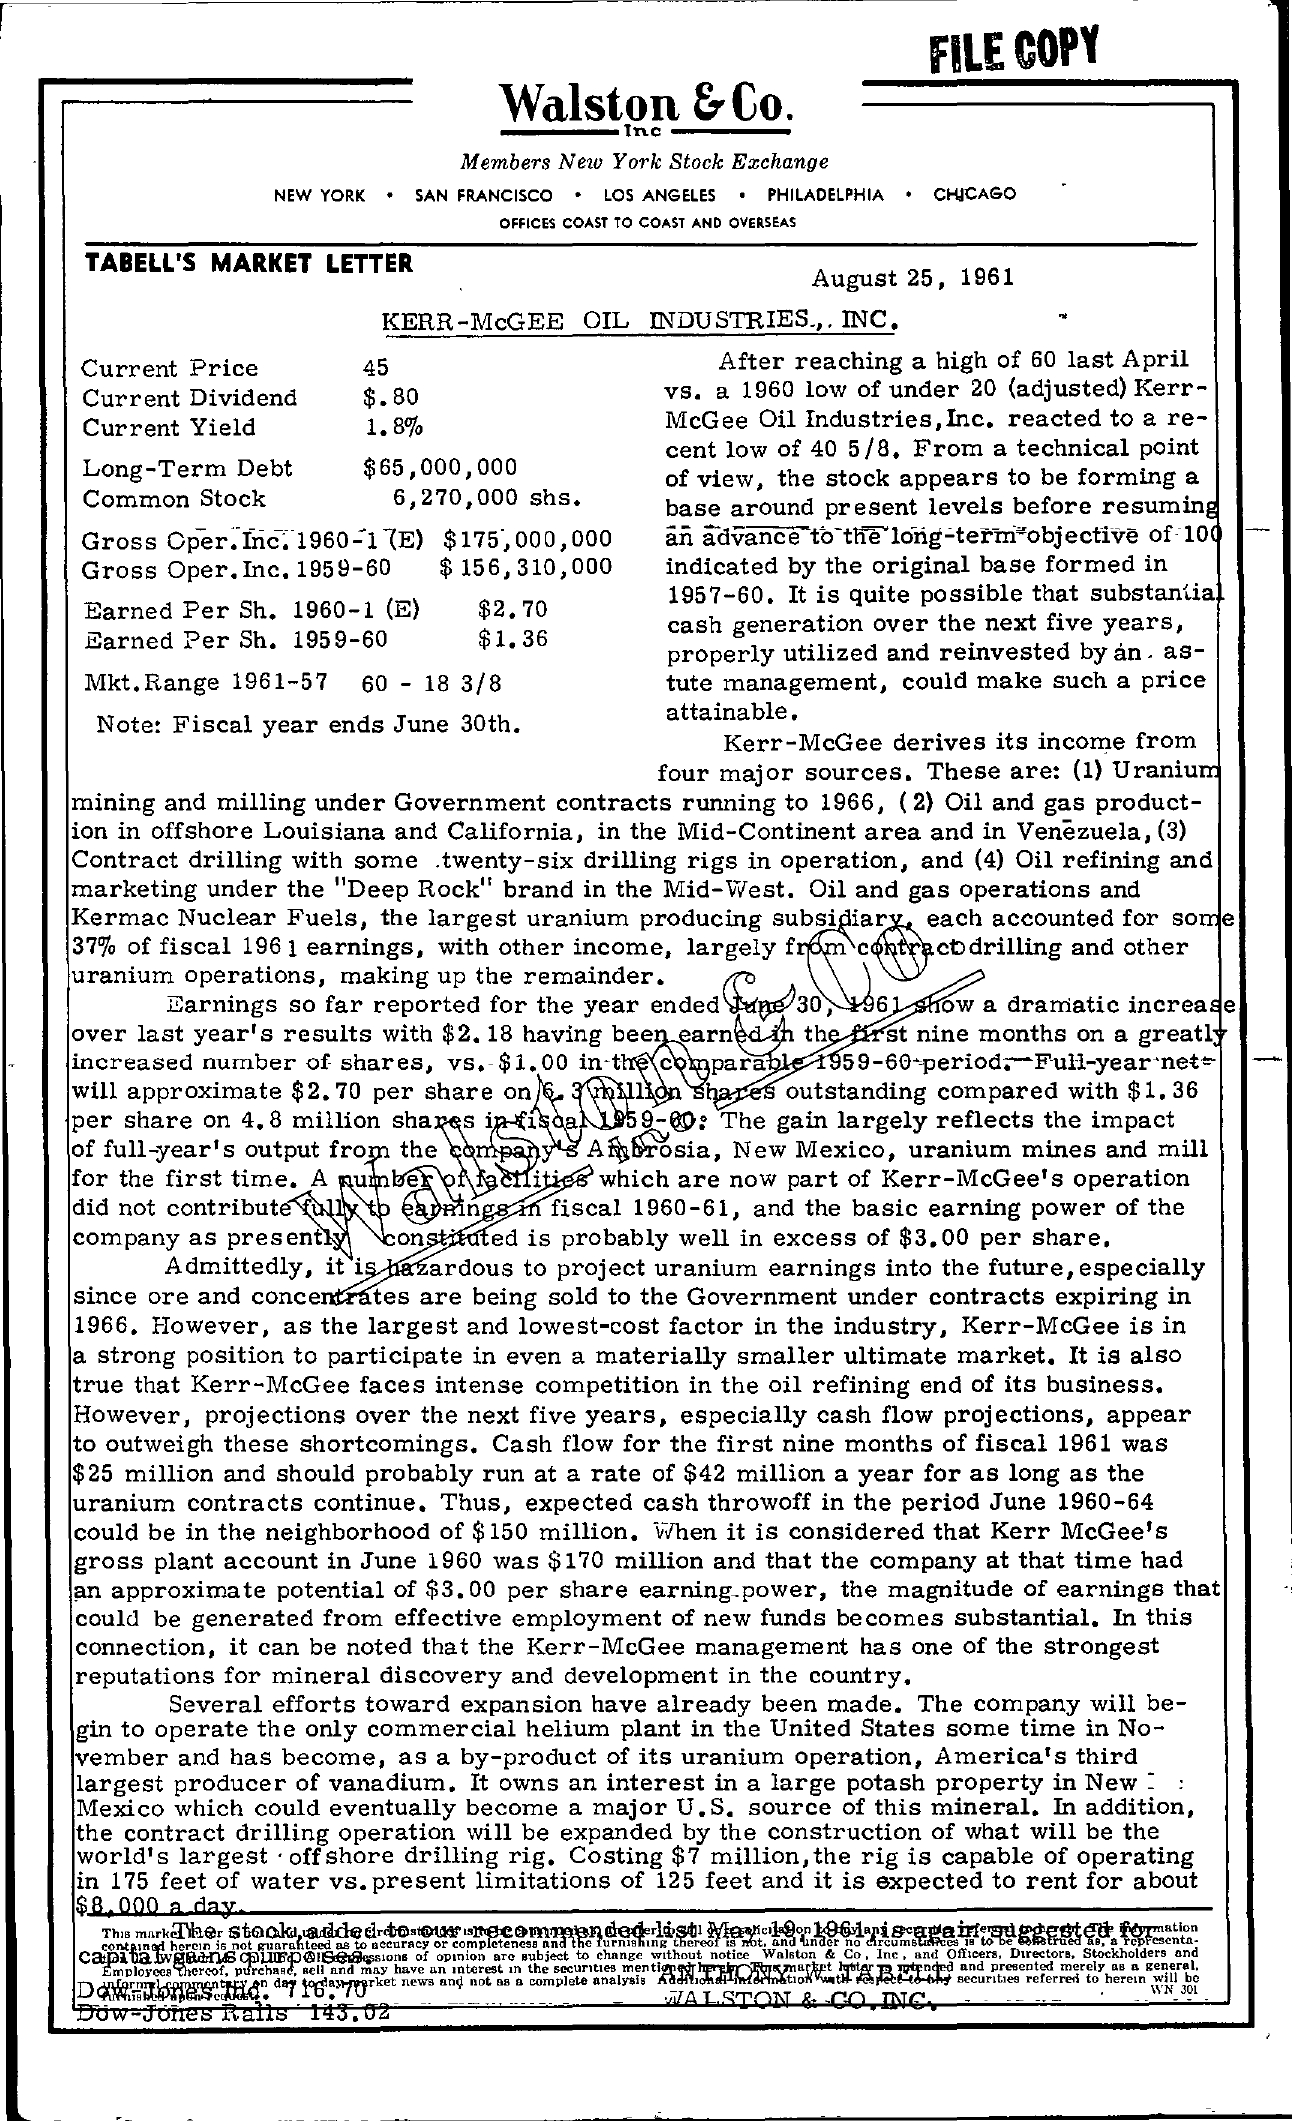 Tabell's Market Letter - August 25, 1961